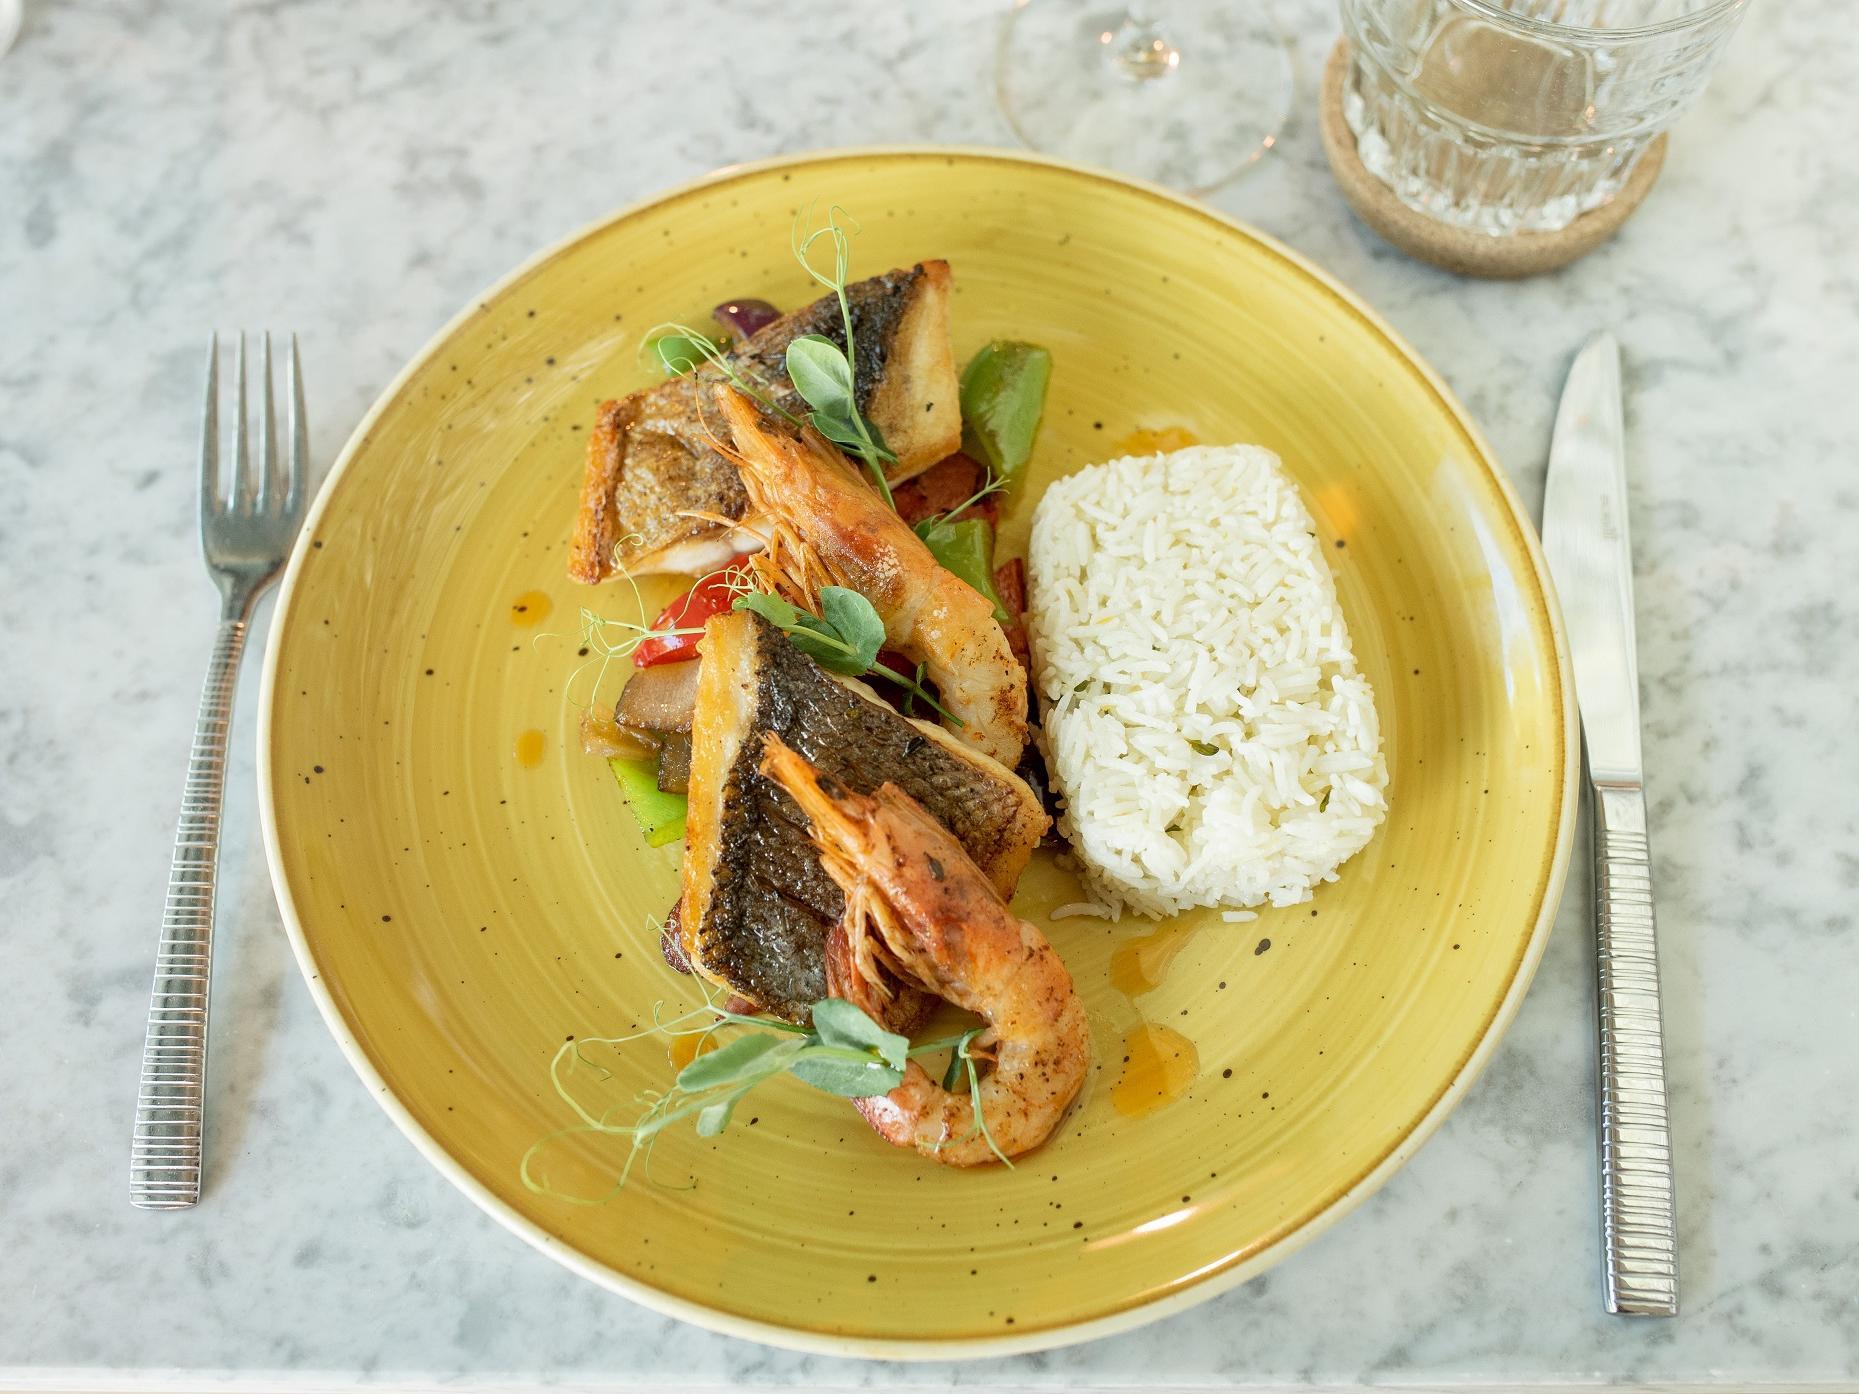 Delicious Food plate -The Magnolia Hotel